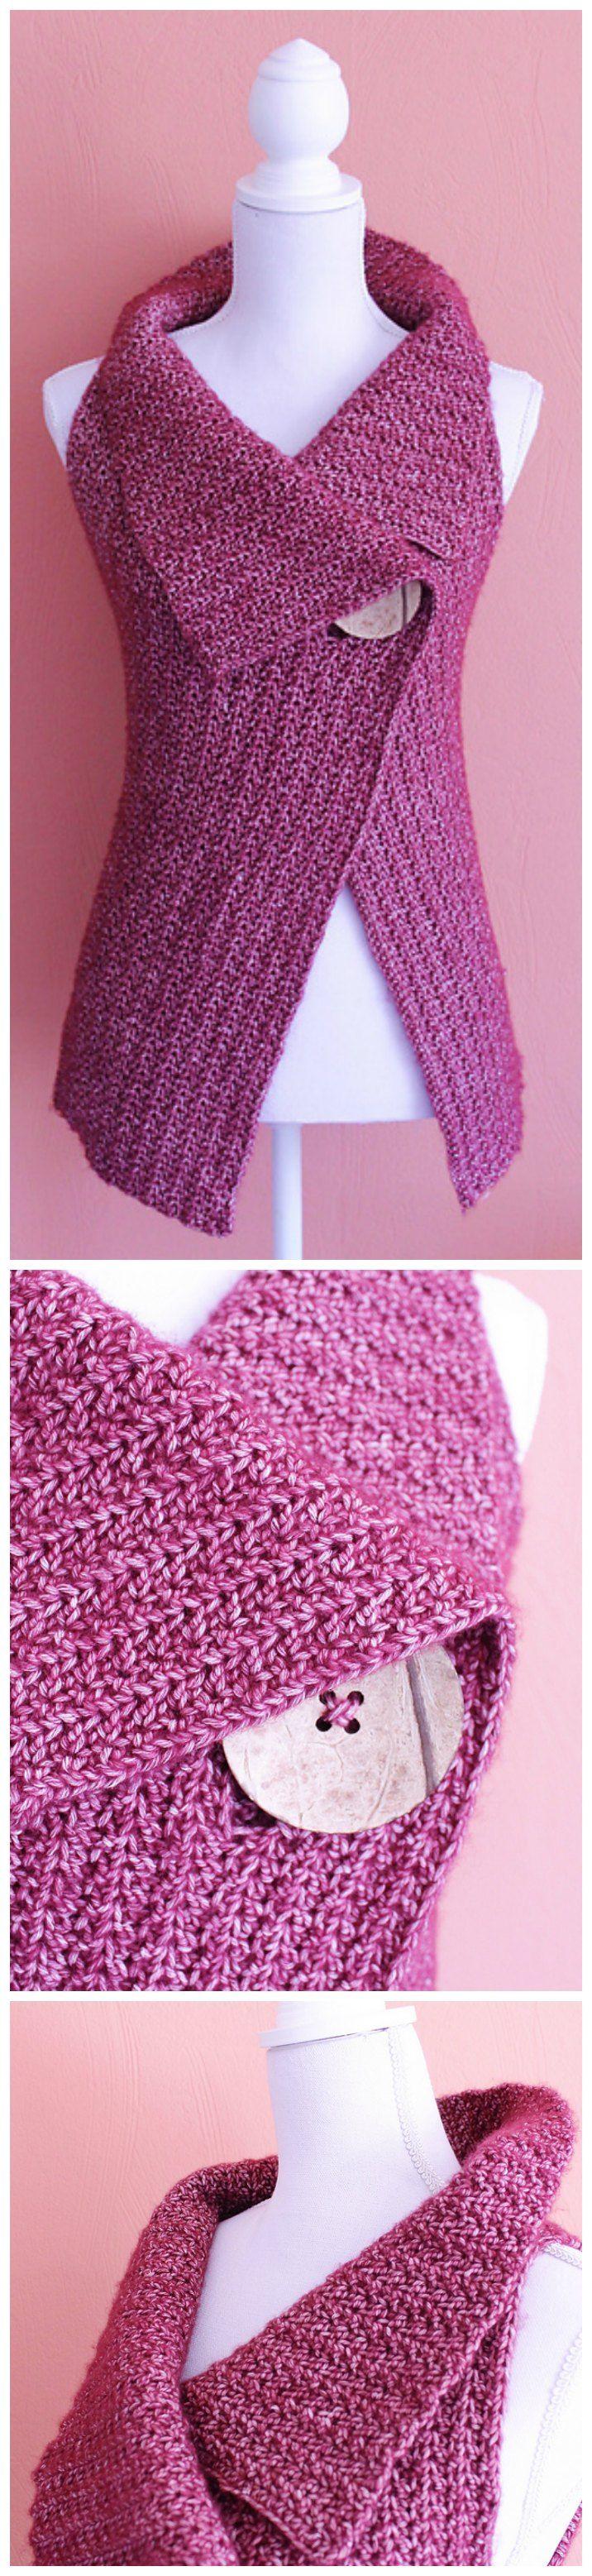 very pretty... need a crochet version